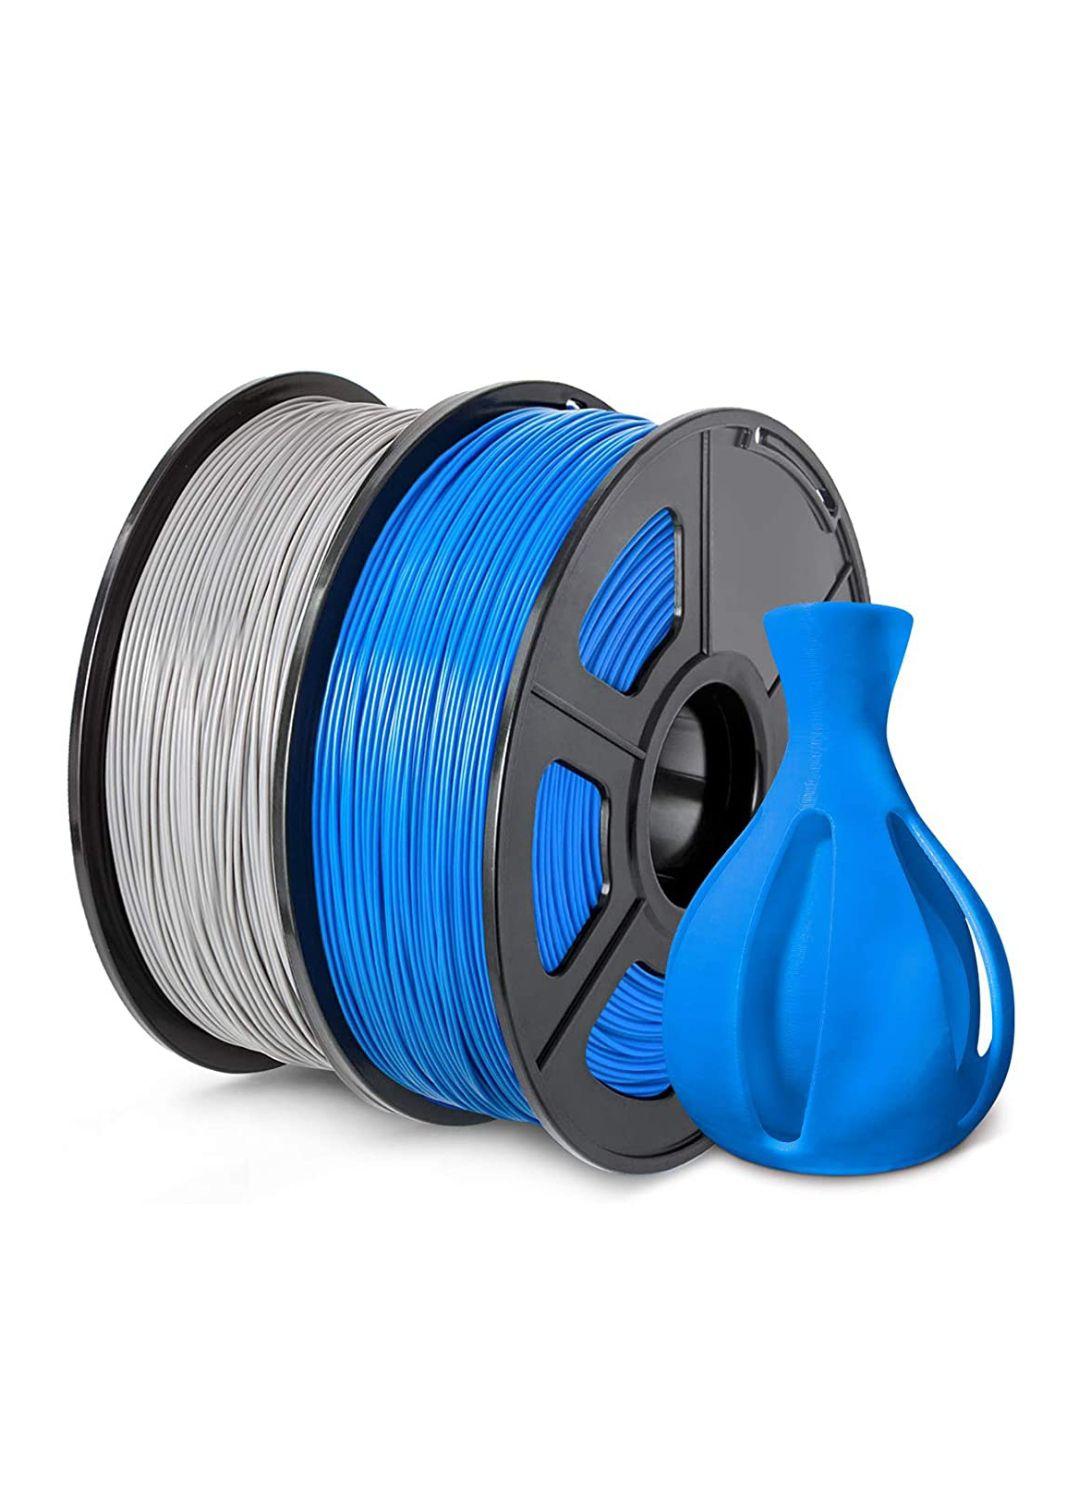 Filamento ABS 1.75mm, SUNLU para impresora 3D